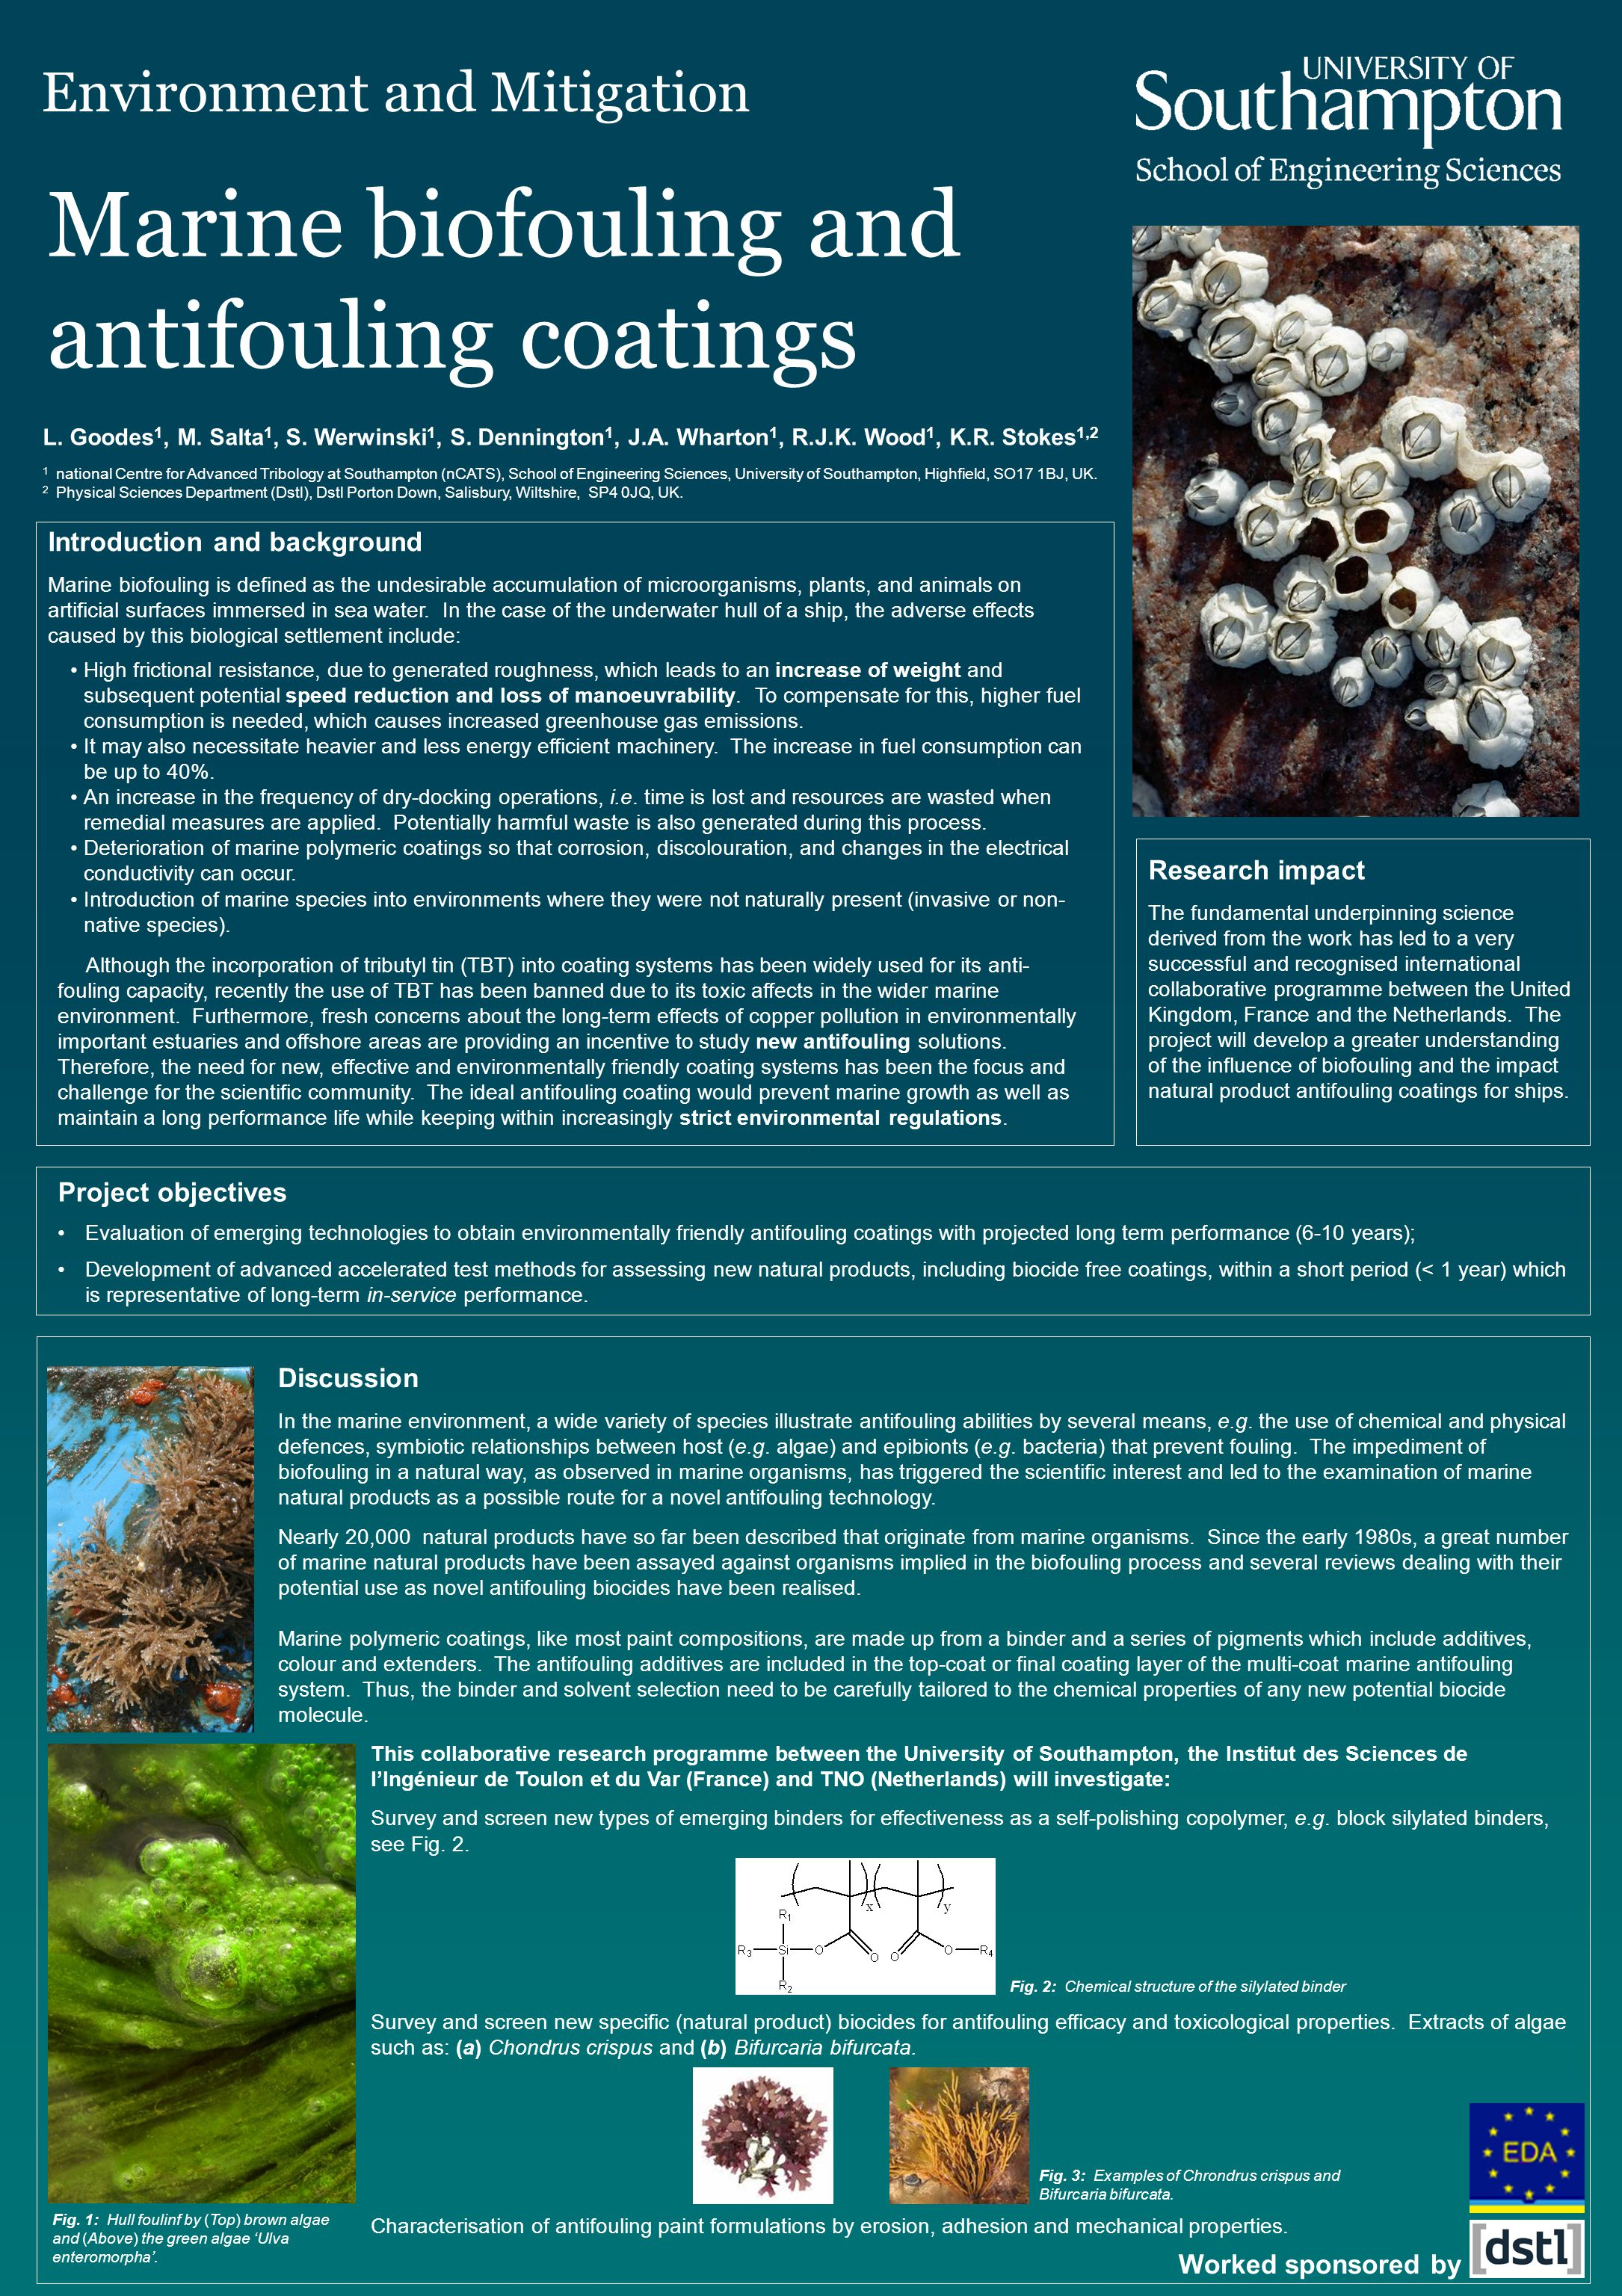 Marine biofouling and antifouling coatings L. Goodes 1, M.